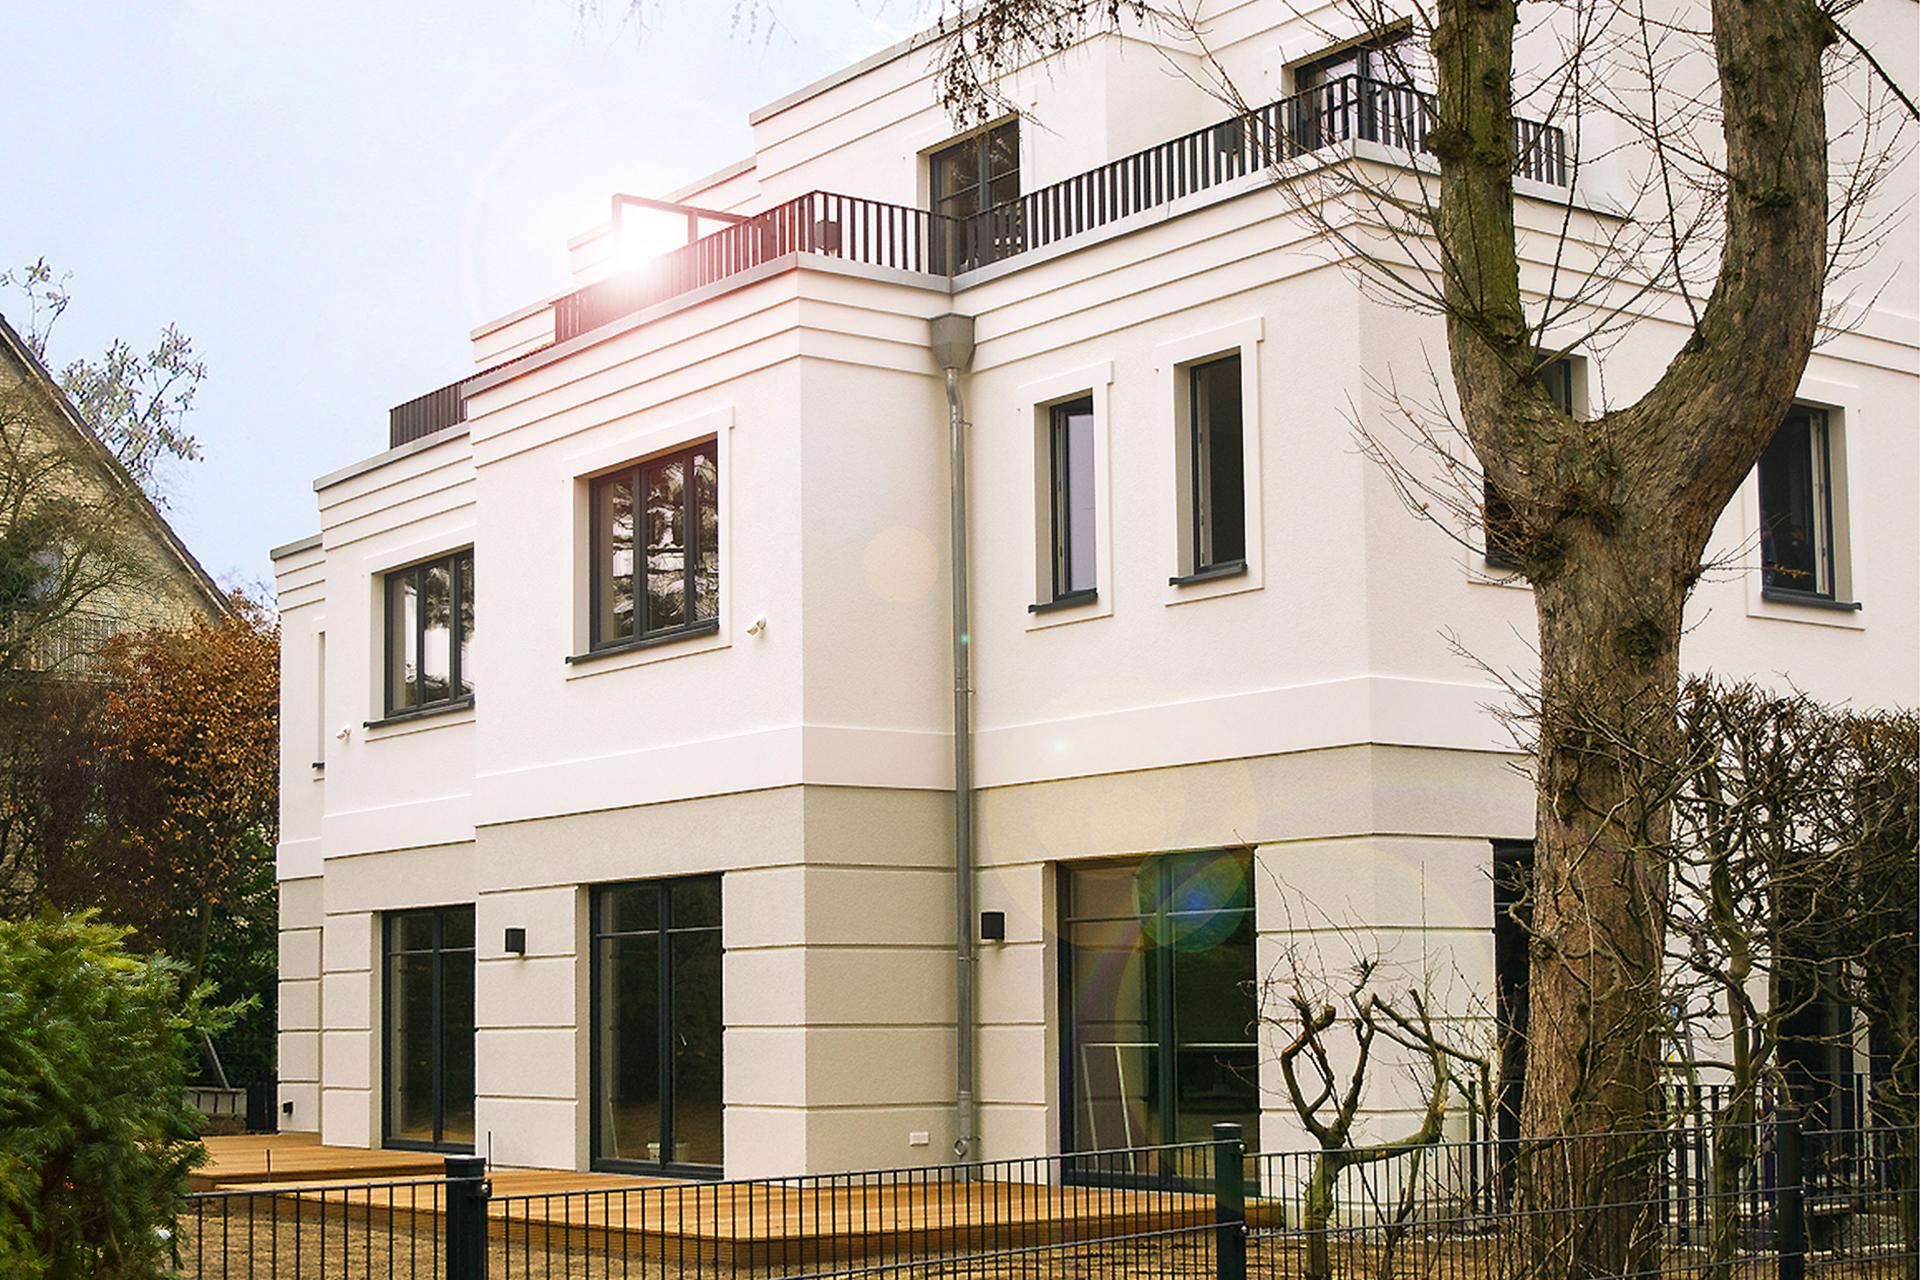 LIG (Wohnbauten) Klassisch historisch